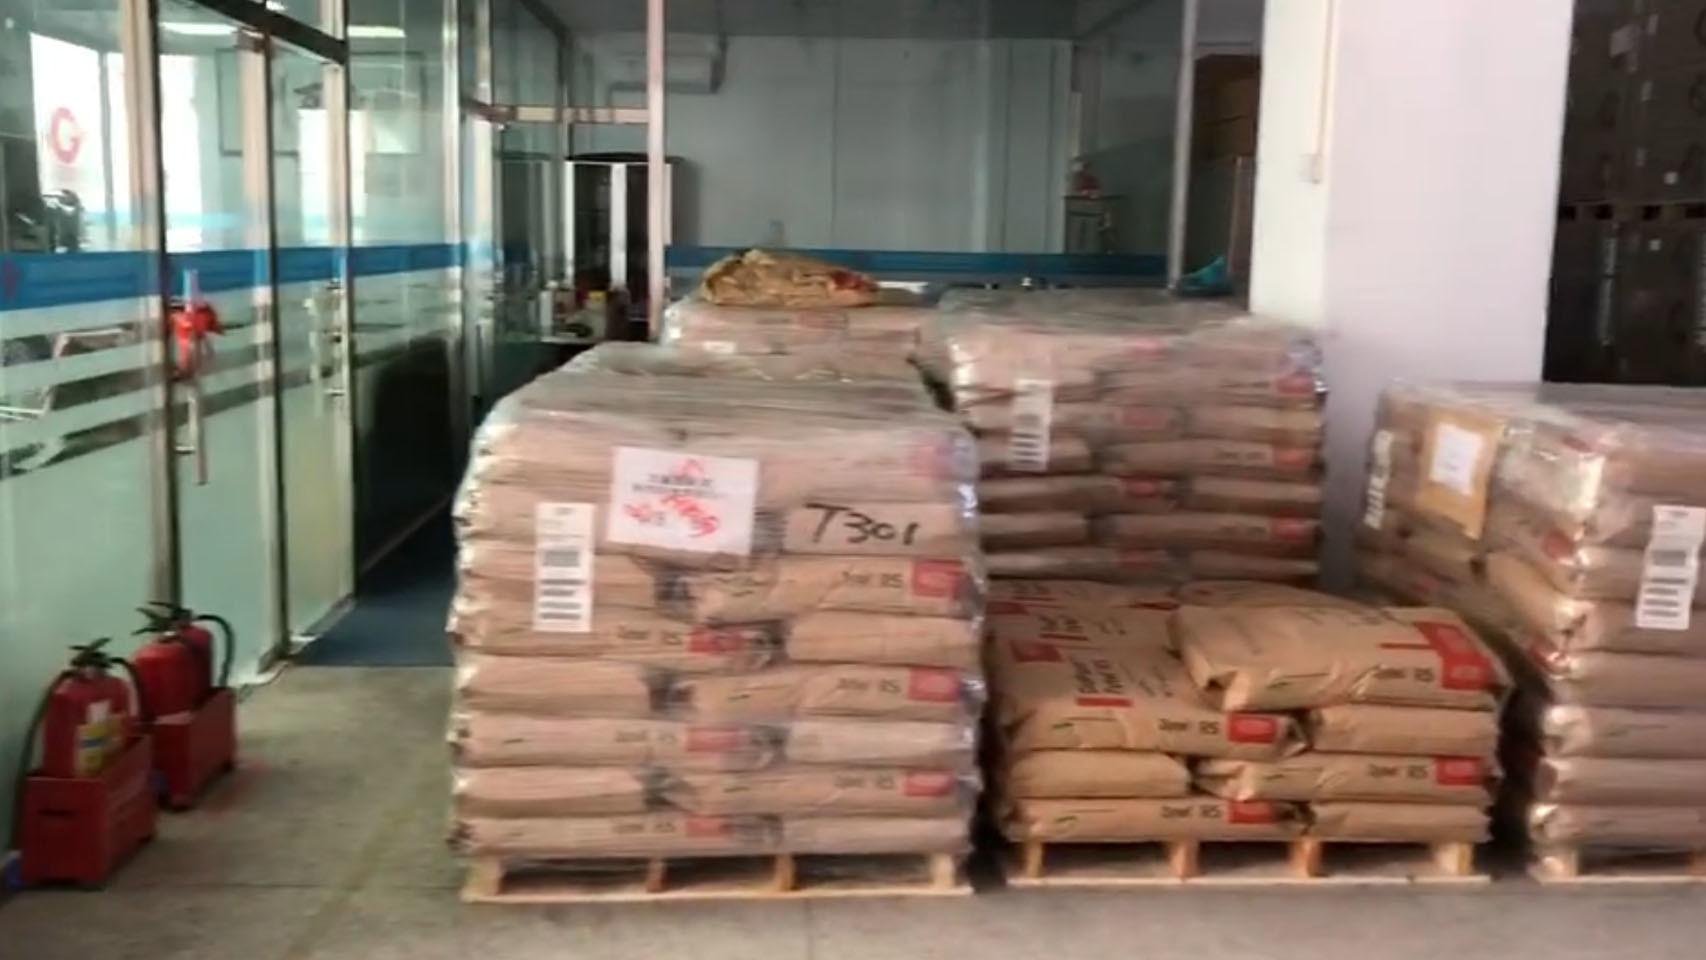 Shenzhen branch 1000 m² warehouse for warehousing service, E-commercial fulfillment service